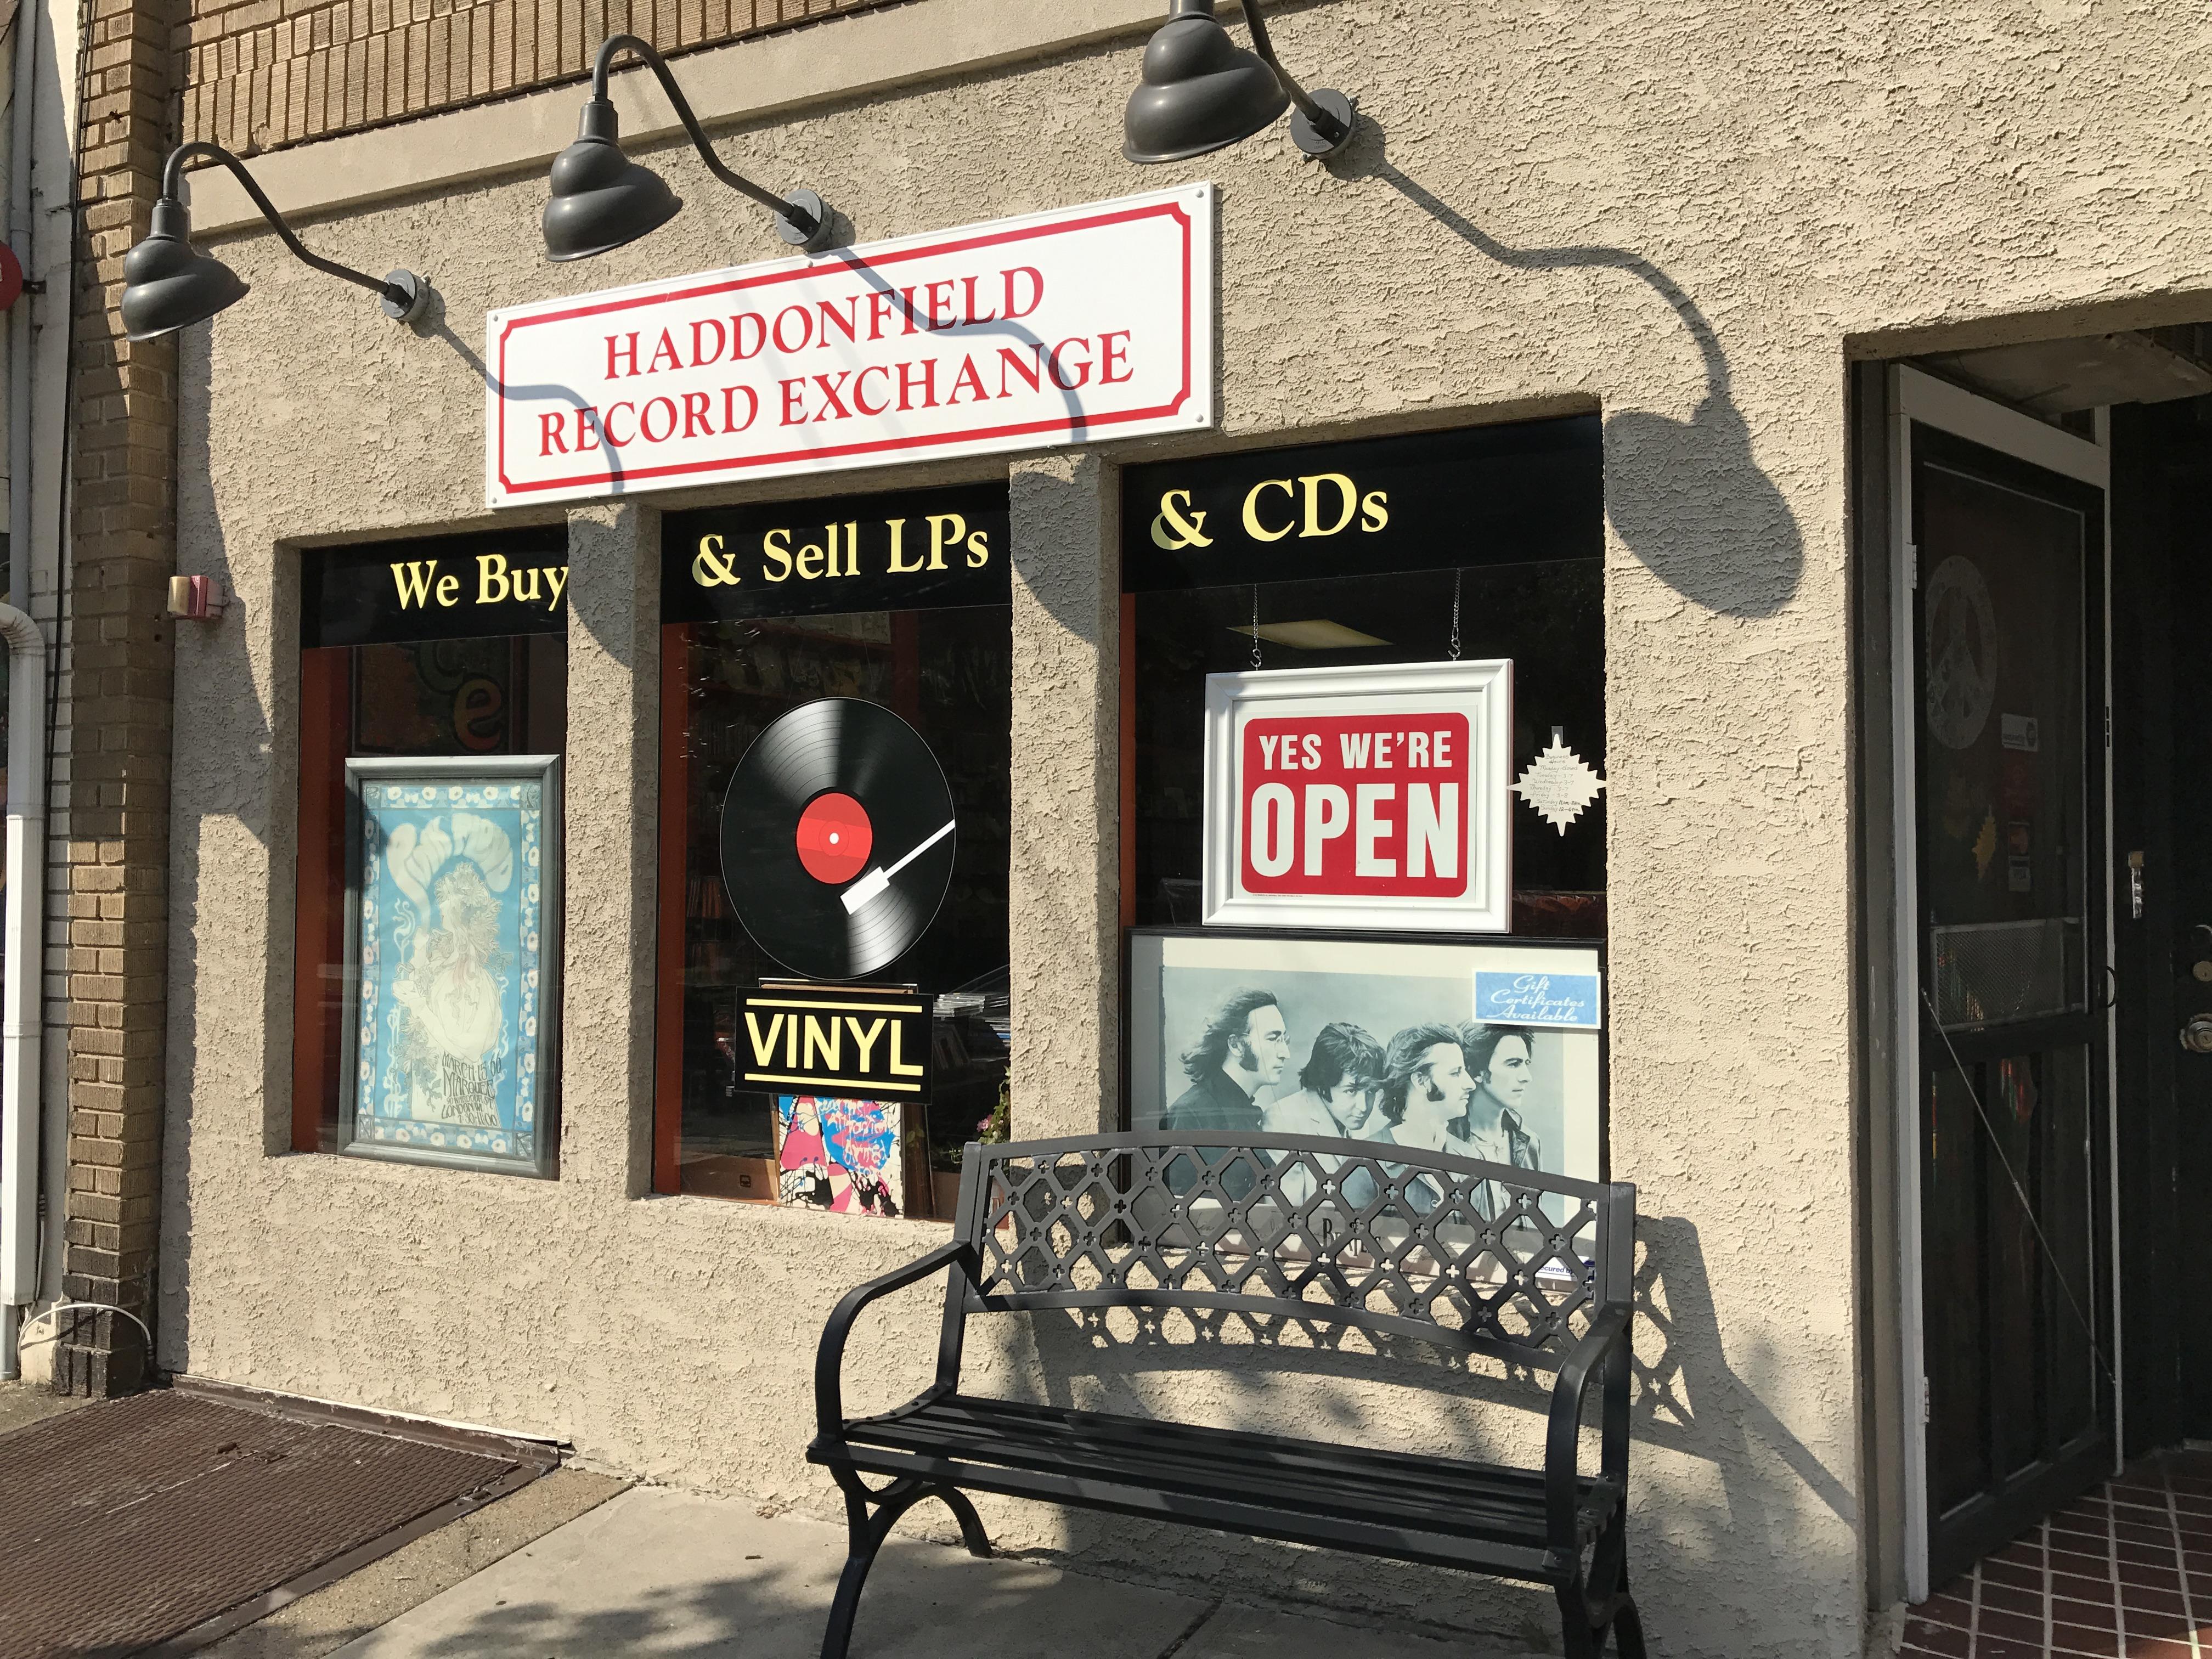 NJ Haddonfield Records Haddonfield